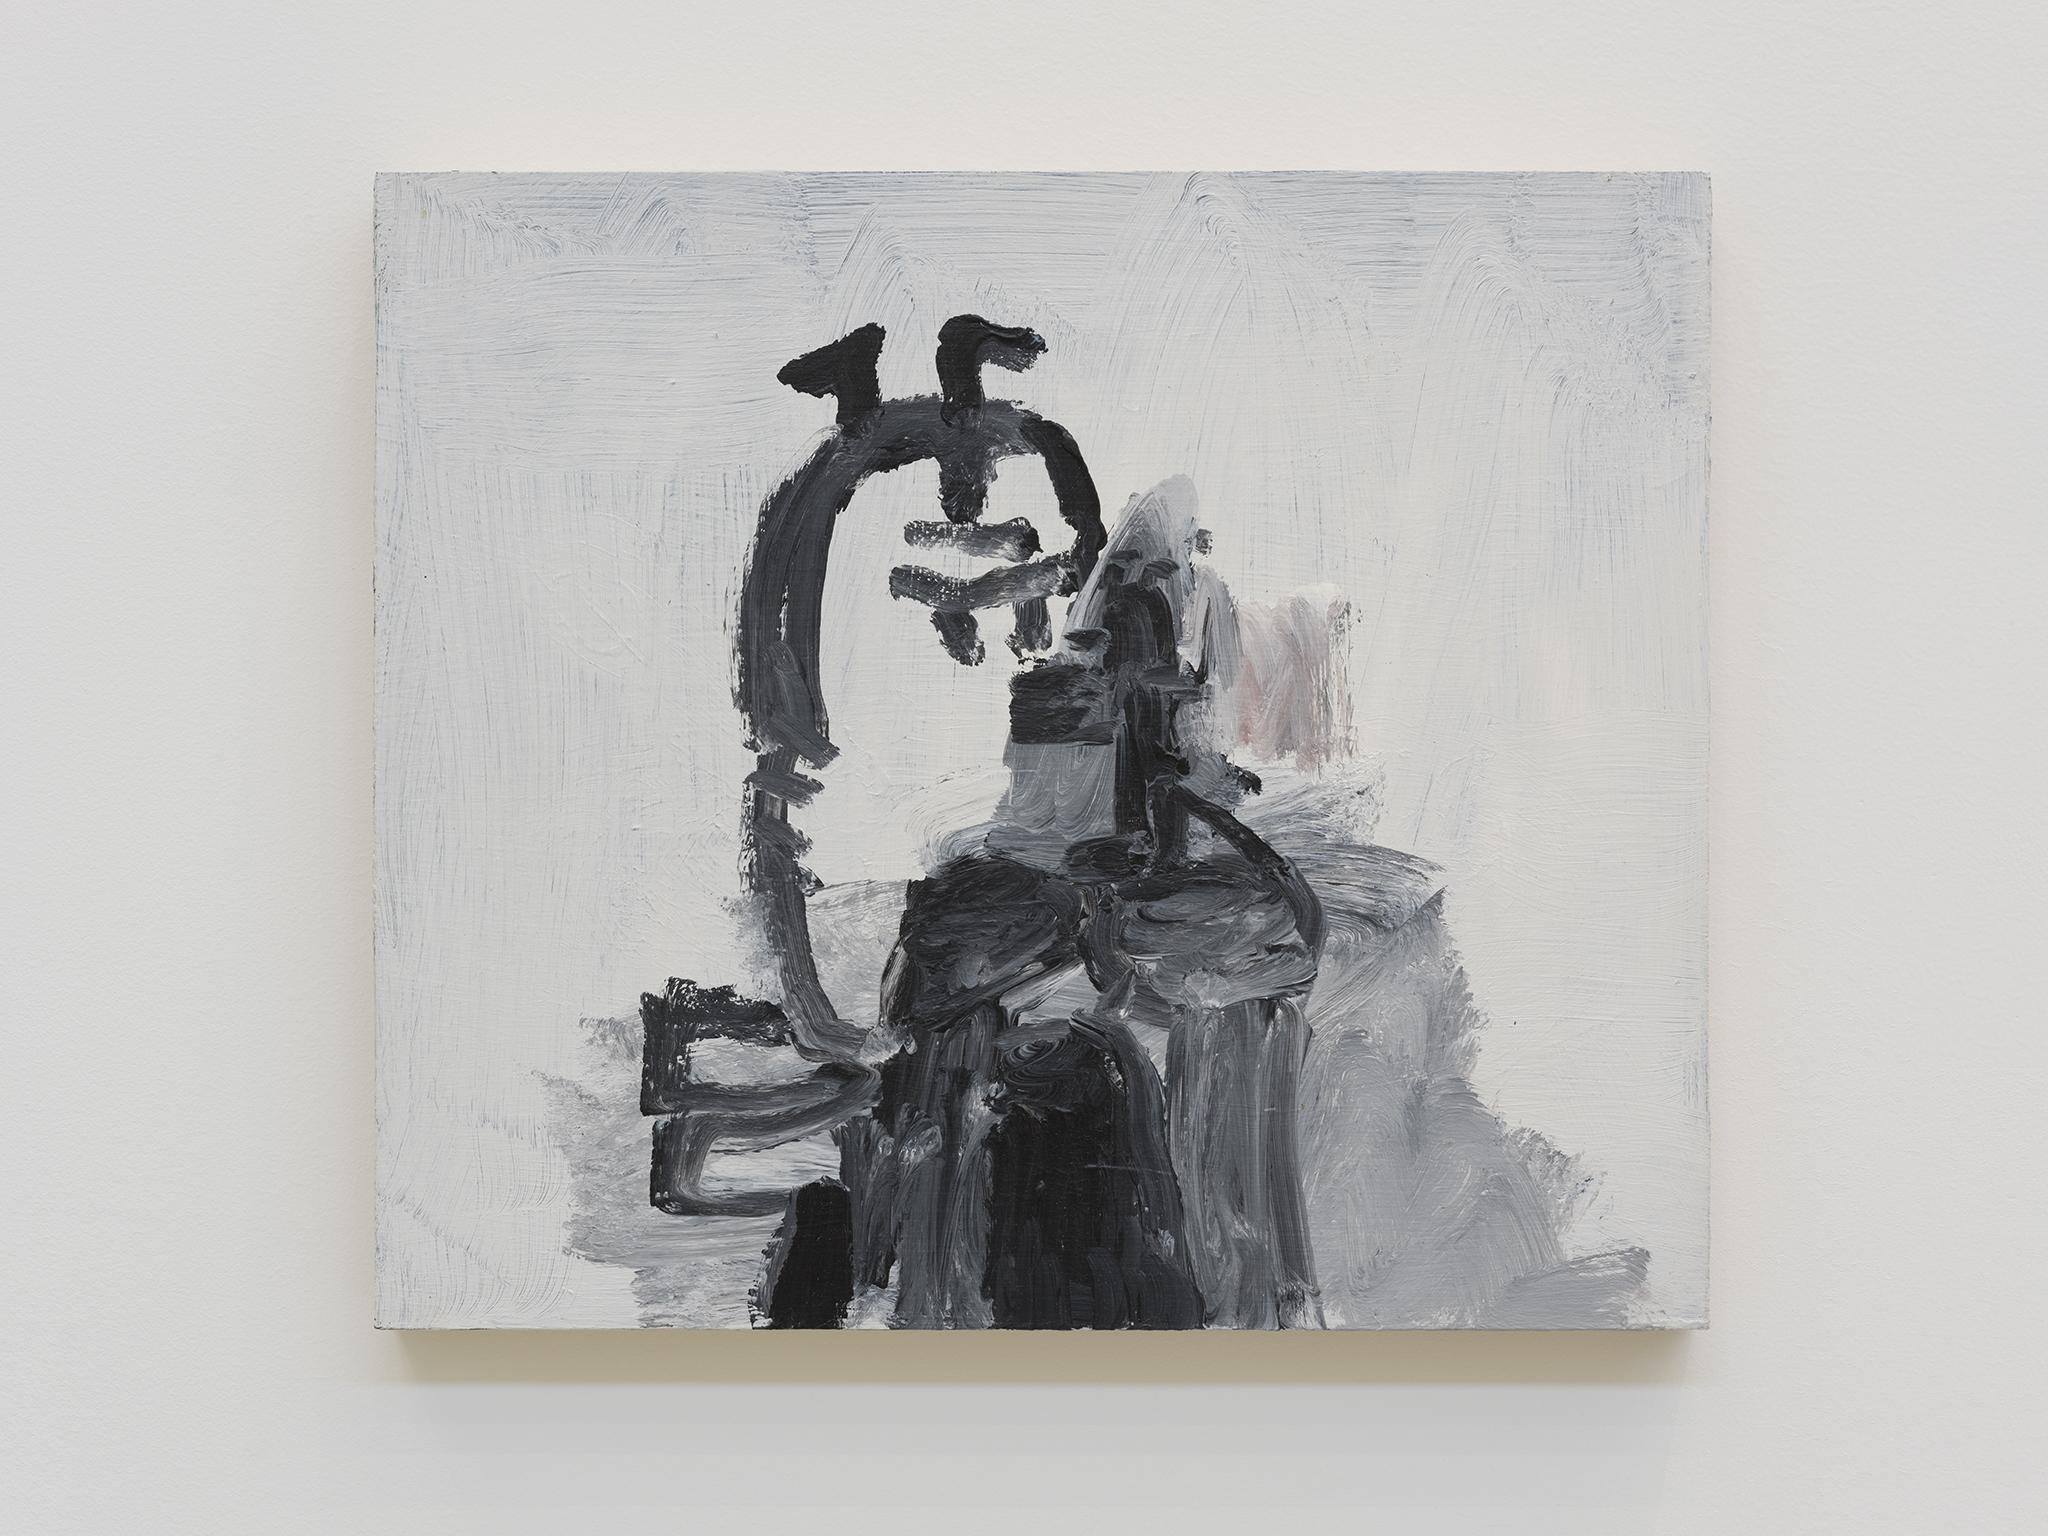 Rob Renpenning, untitled, 1990, acrylic on masonite, 14 x 16 in. (36 x 41 cm) by